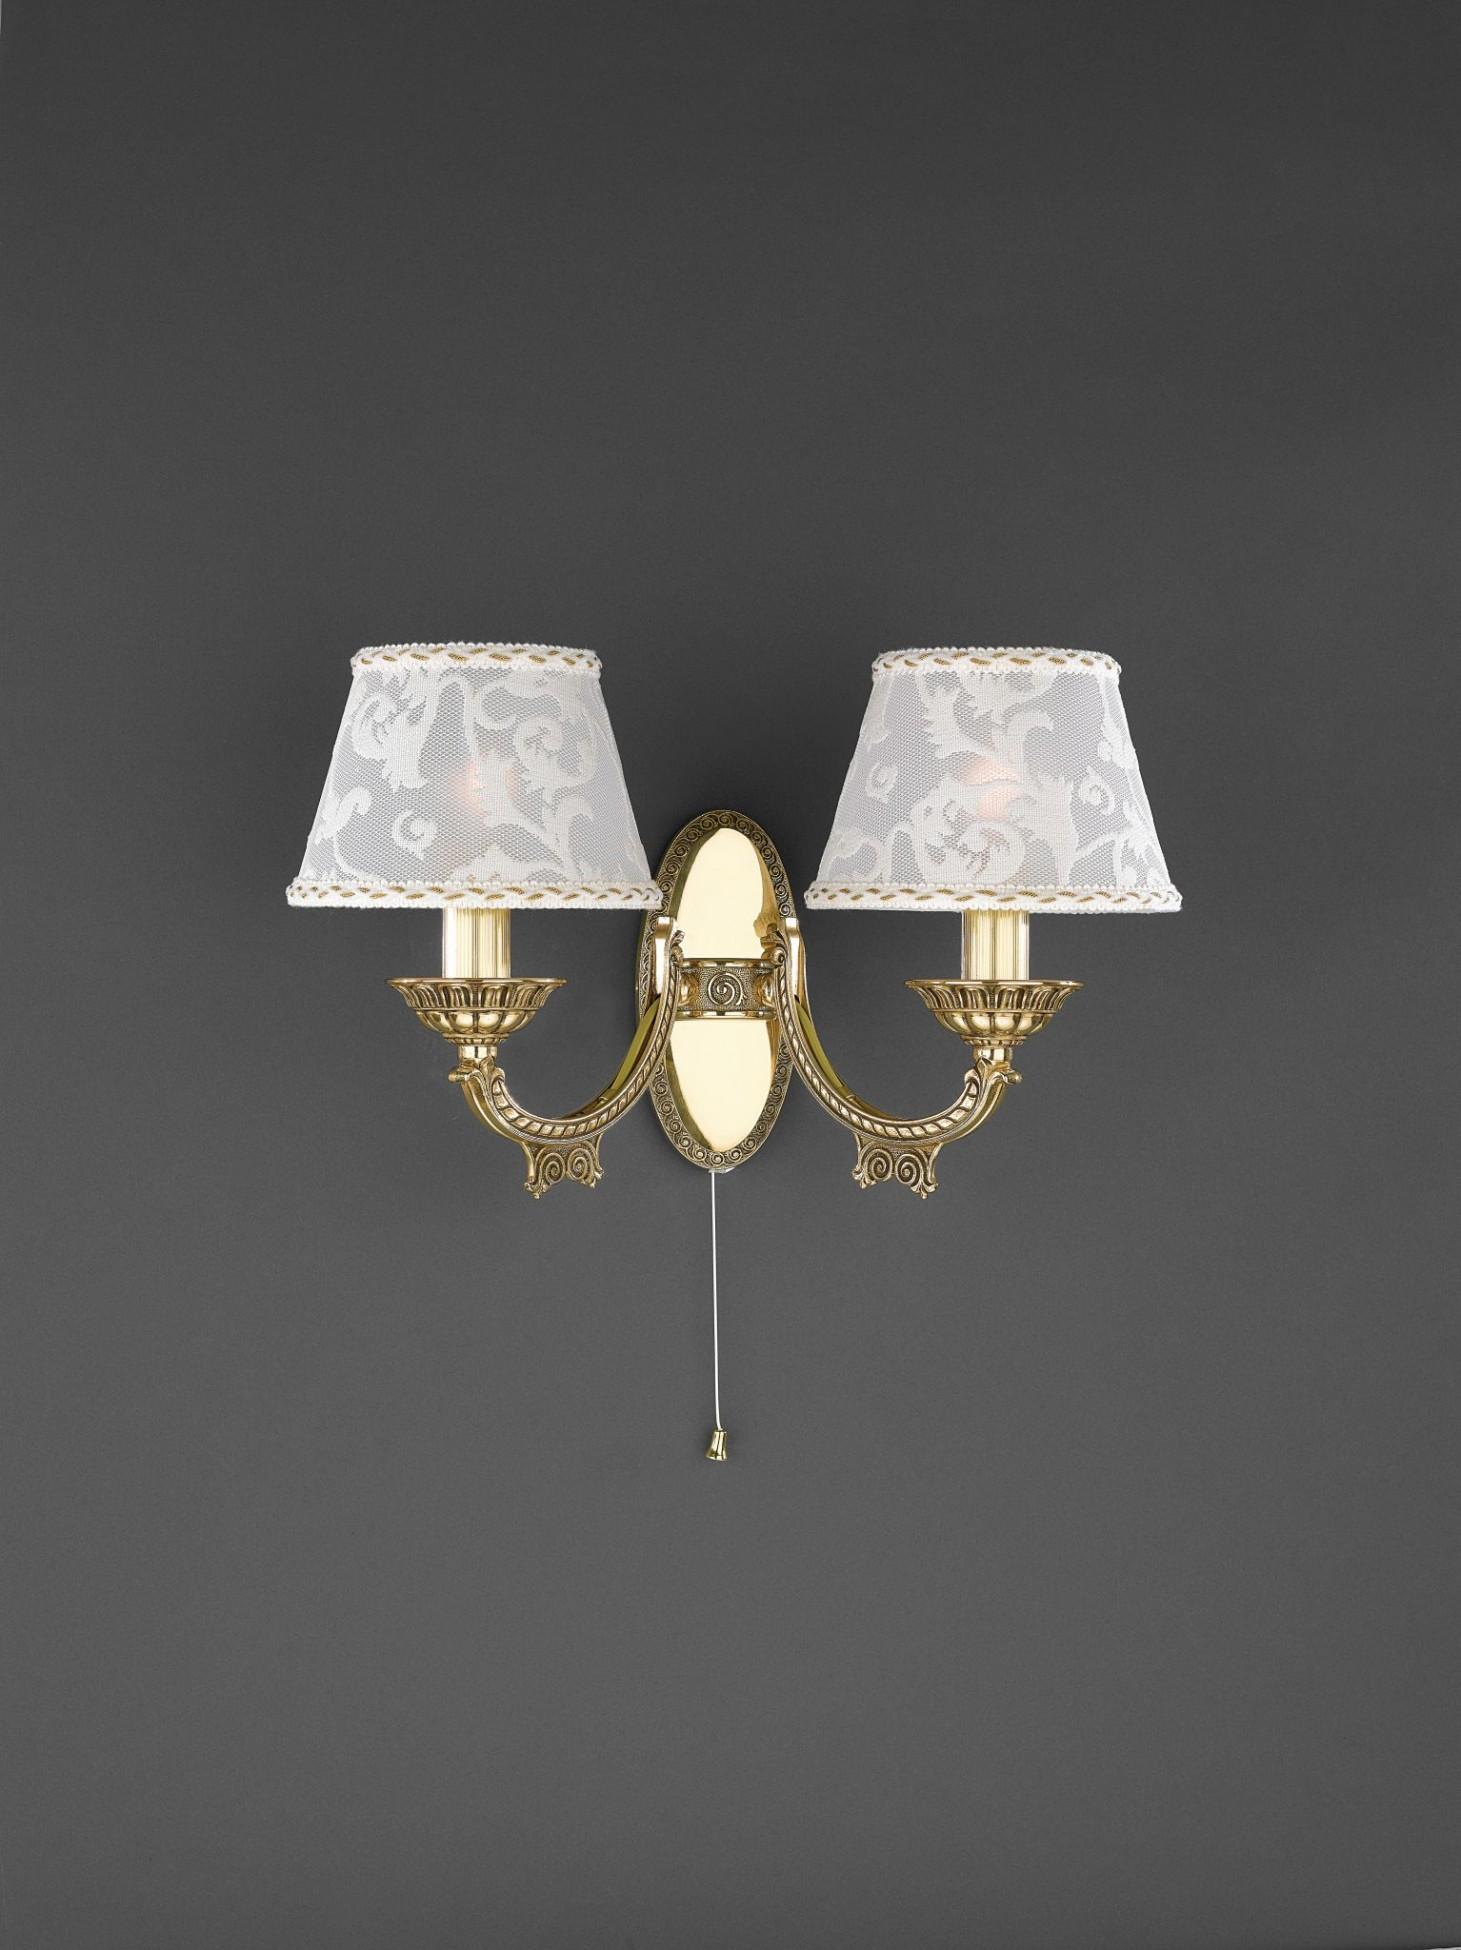 wandlampe aus goldenen messing mit lampenschirm 2 flammig. Black Bedroom Furniture Sets. Home Design Ideas